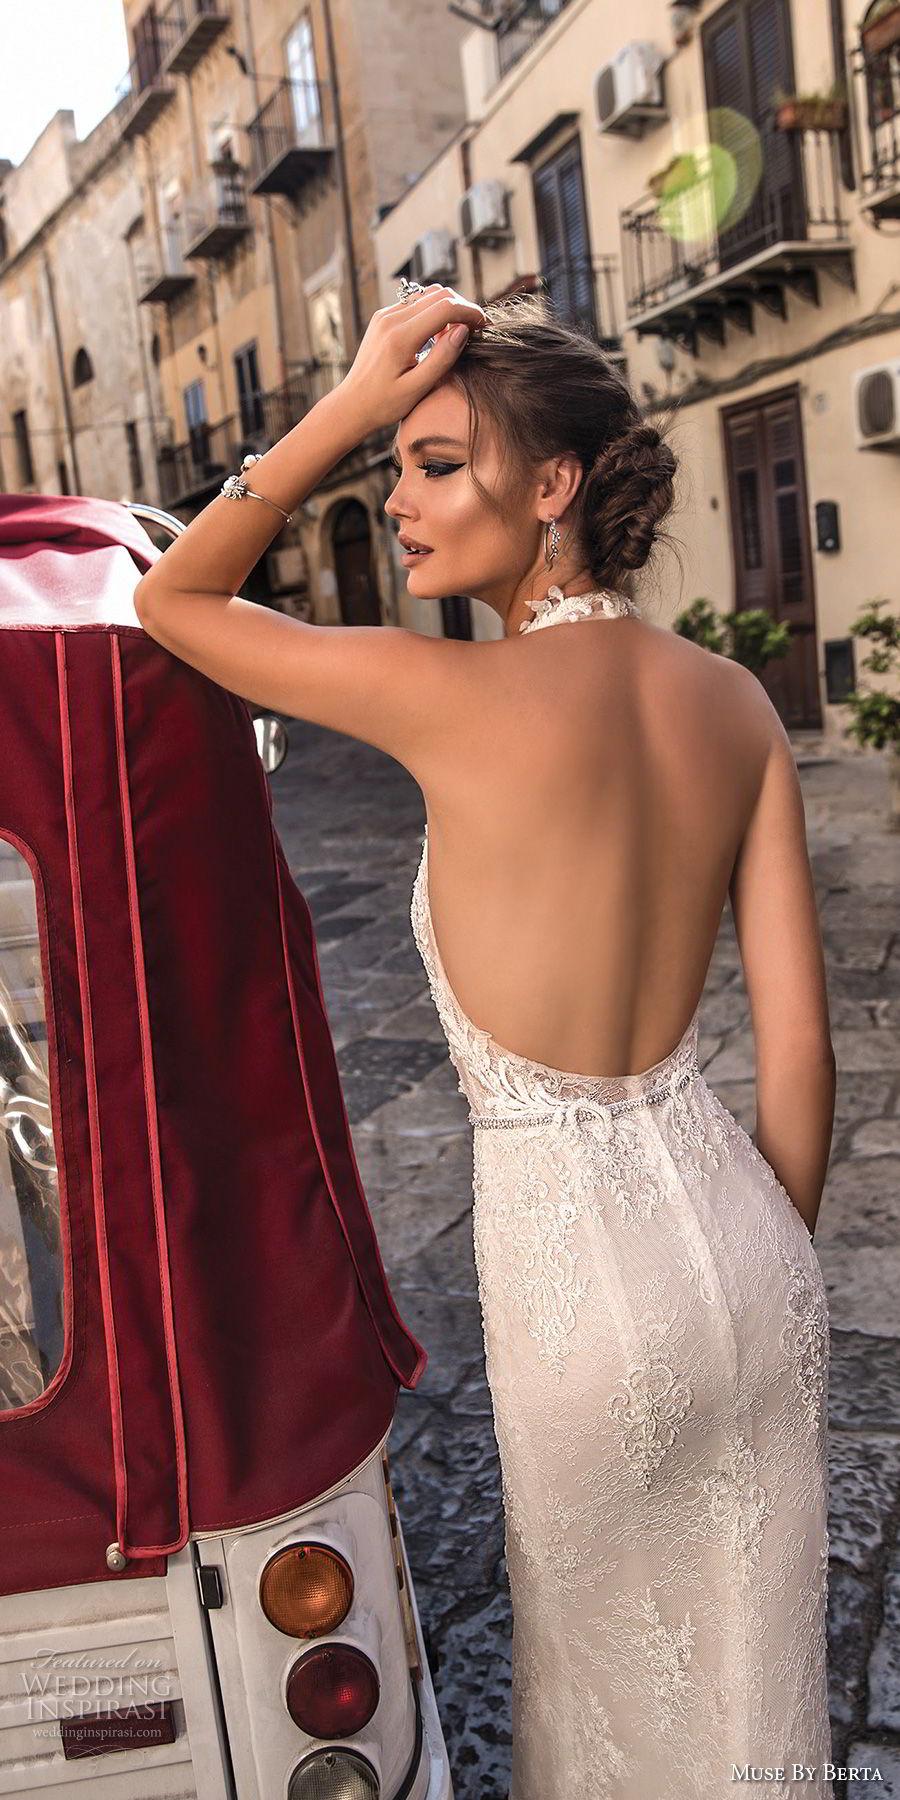 muse-berta-2018-bridal-sleeveless-halter-neck-deep-plunging-v-neck-full-embellishment-elegant-sexy-sheath-wedding-dress-open-back-sweep-train-12-zbv